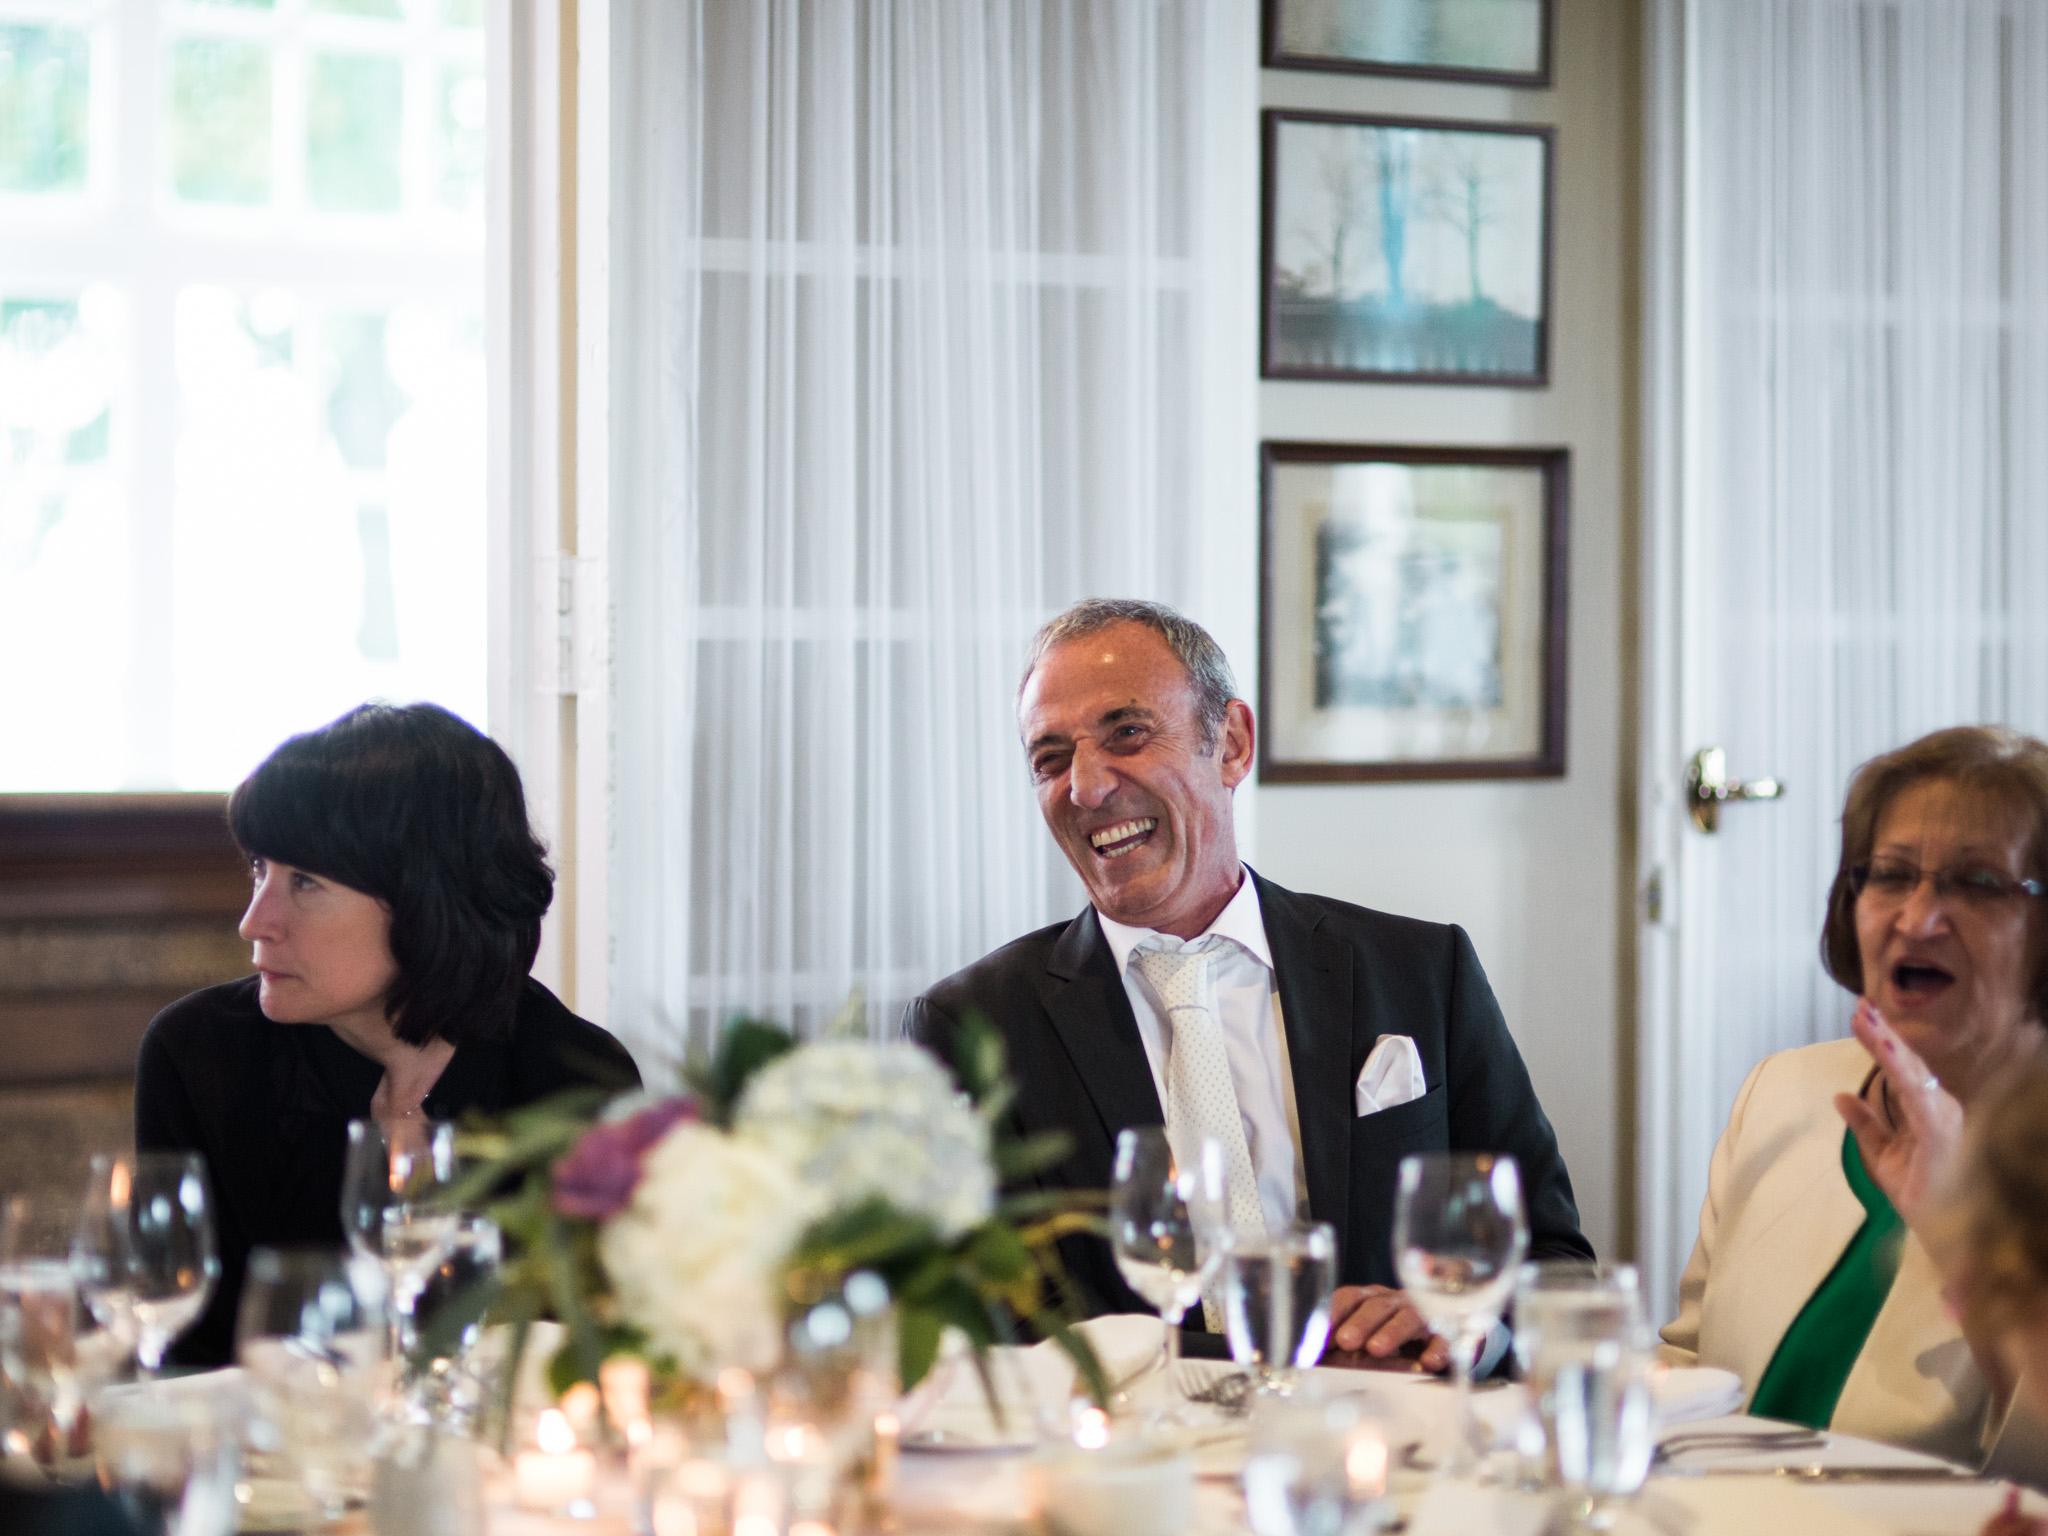 toronto-island-Royal-canadian-yacht-club-wedding-photographer-48